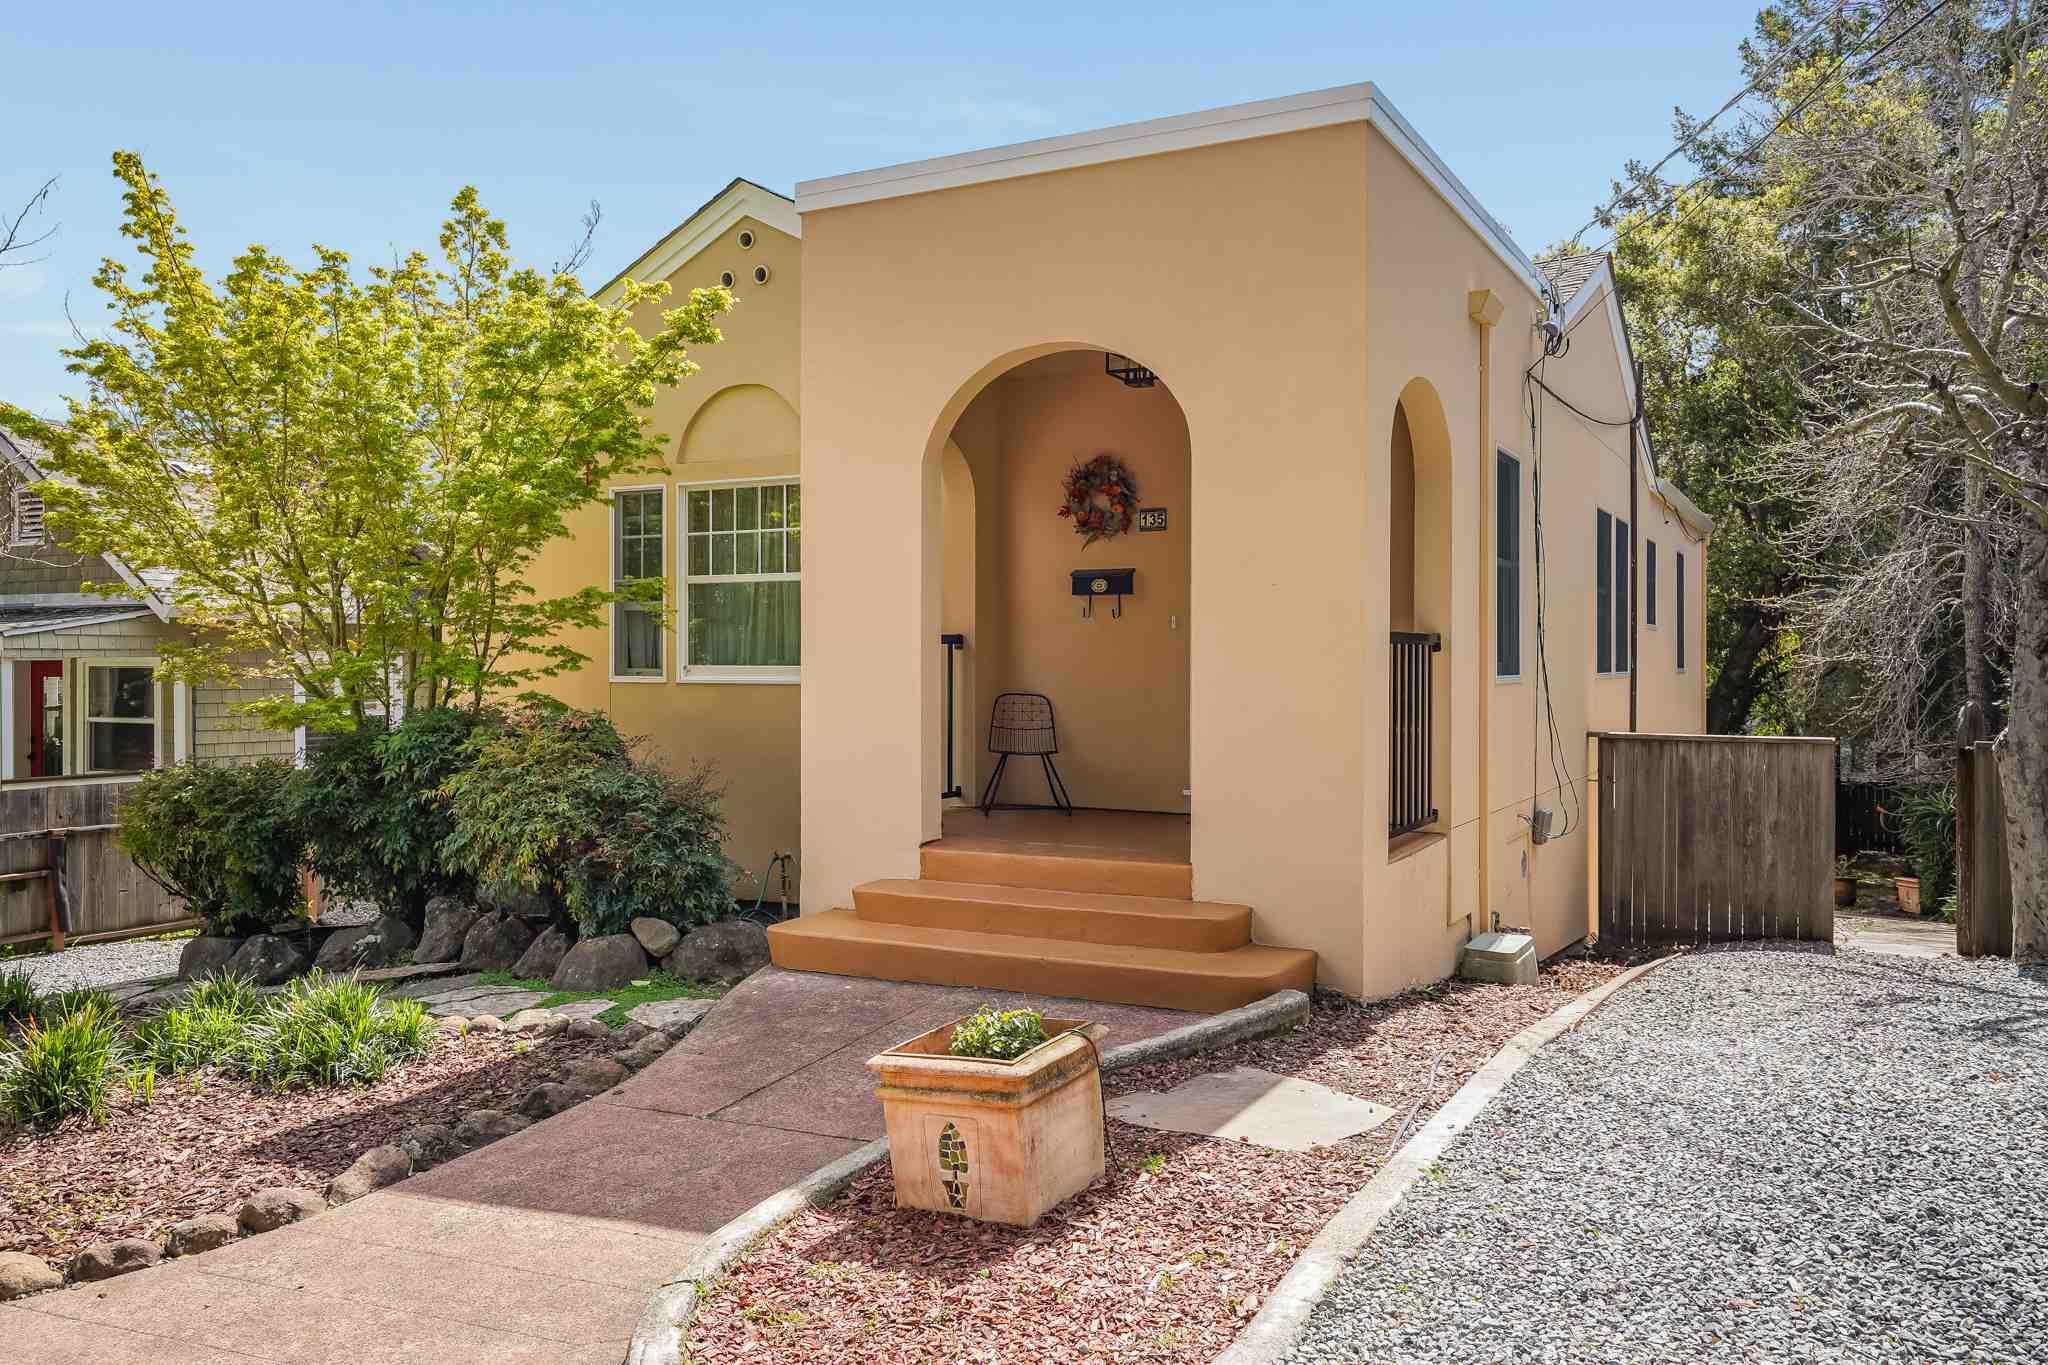 135 Ross St,San Rafael,California 94901,4 Bedrooms Bedrooms,2 BathroomsBathrooms,Single Family Home,Ross,1019